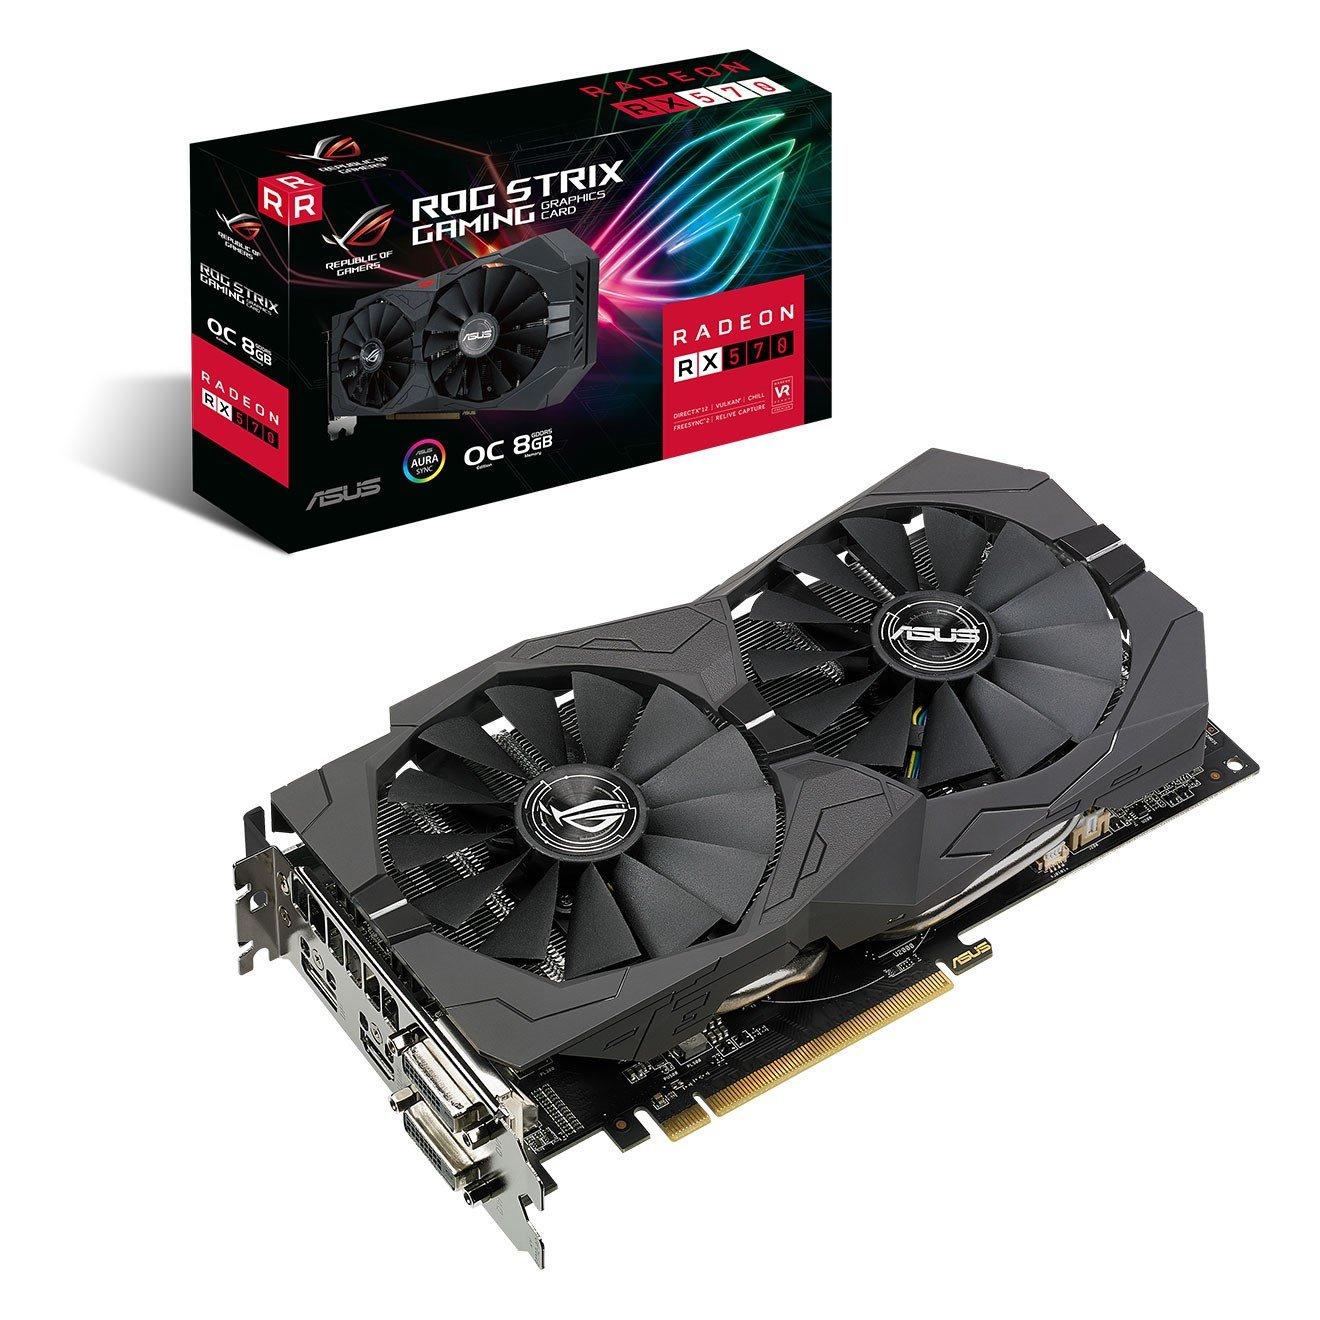 ASUS Radeon RX 570 ROG Strix 8GB OC GPU £179.99 delivered @ CCOnline